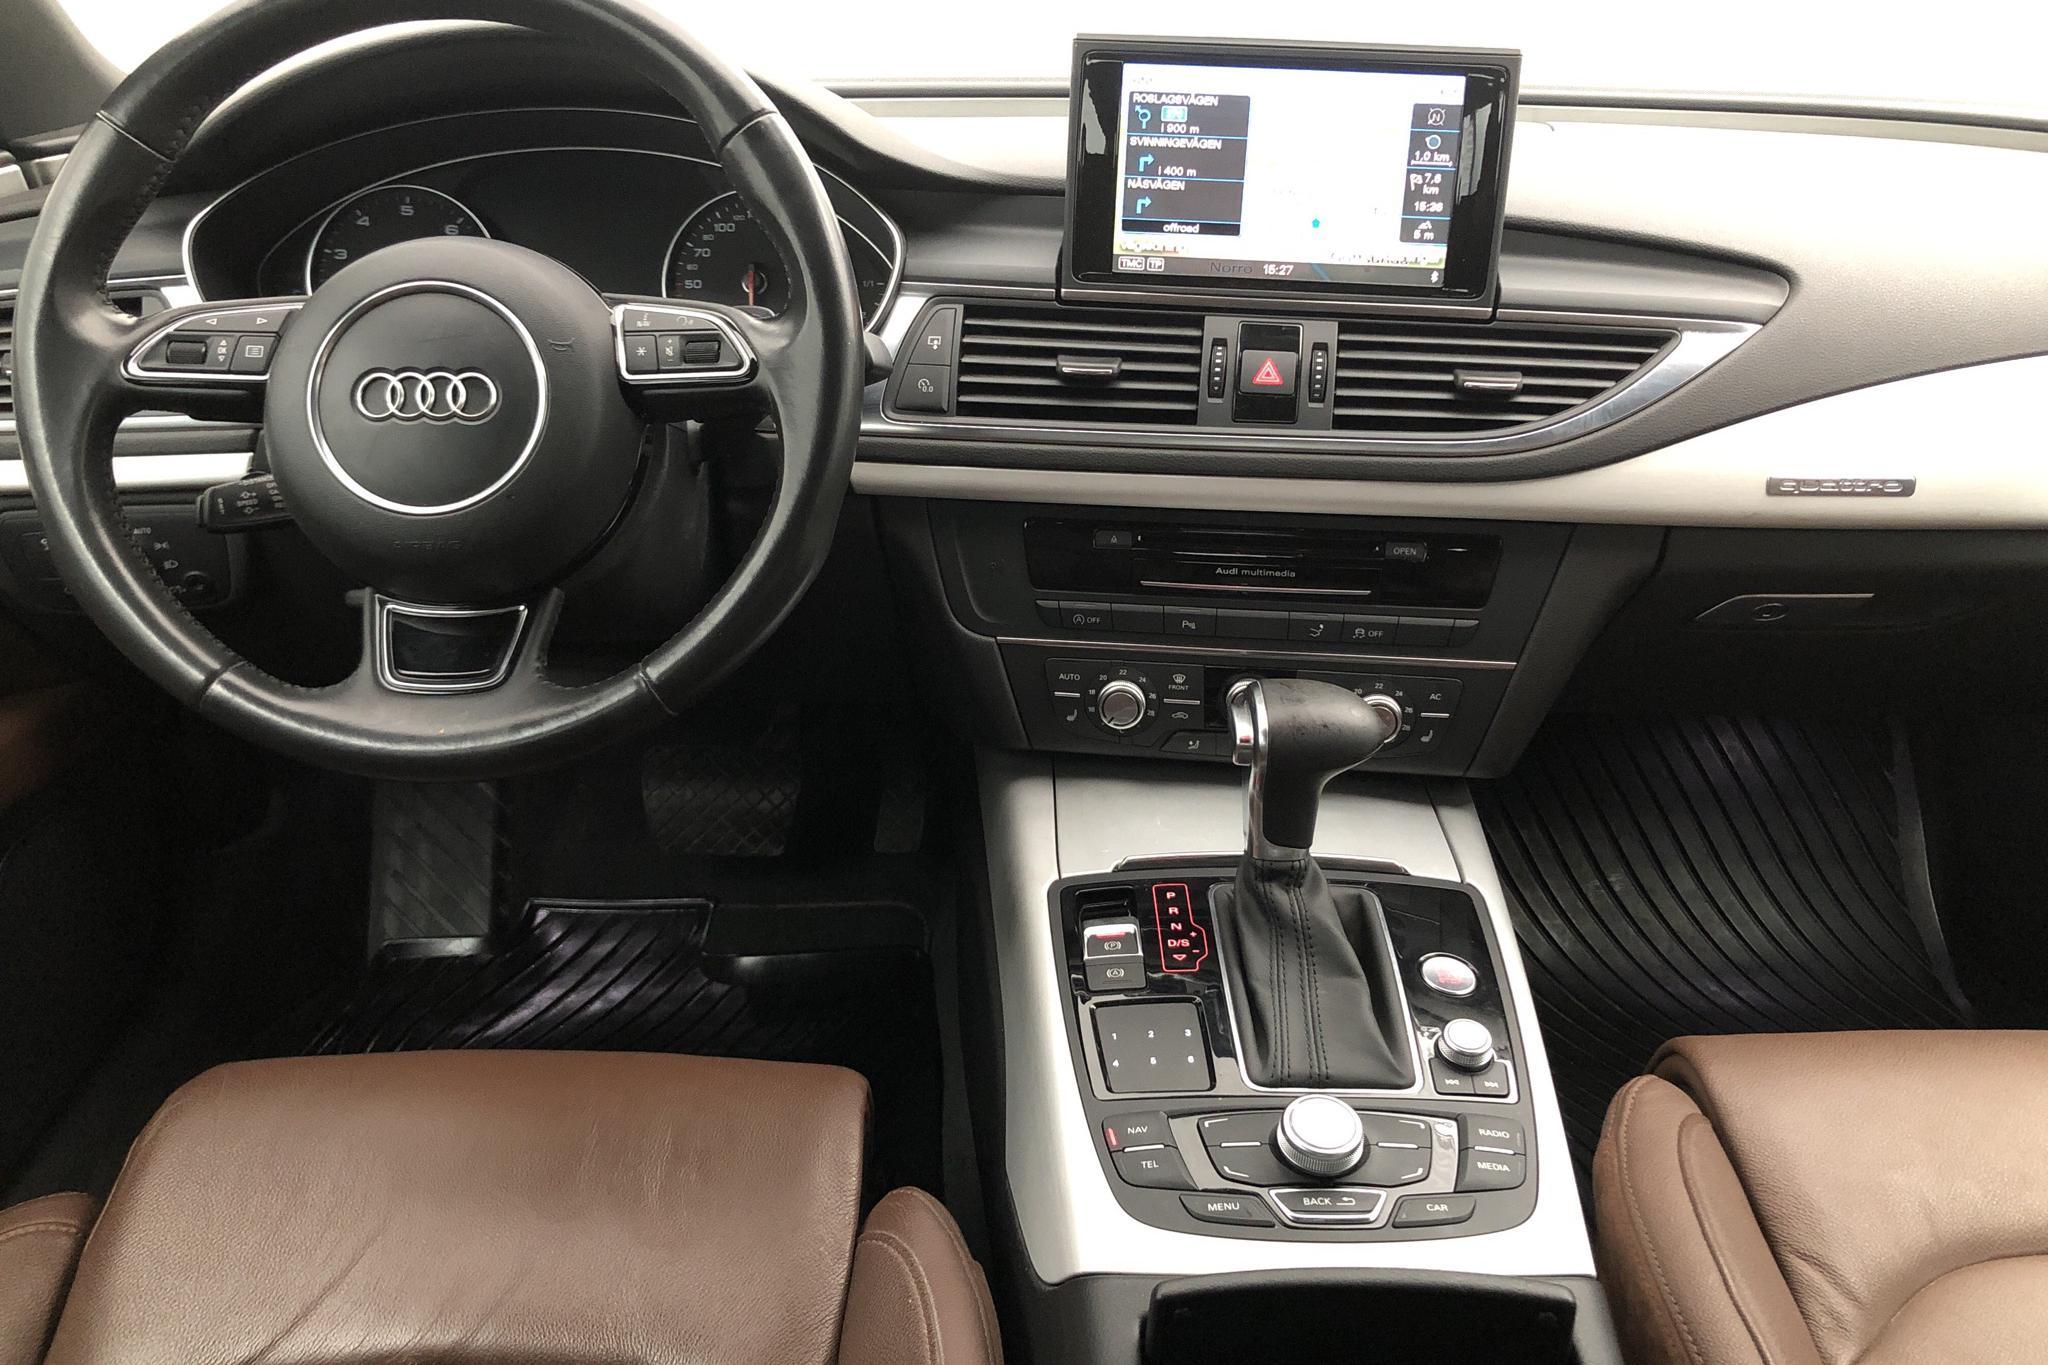 Audi A7 3.0 TFSI Sportback quattro (310hk) - 97 000 km - Automatic - black - 2014